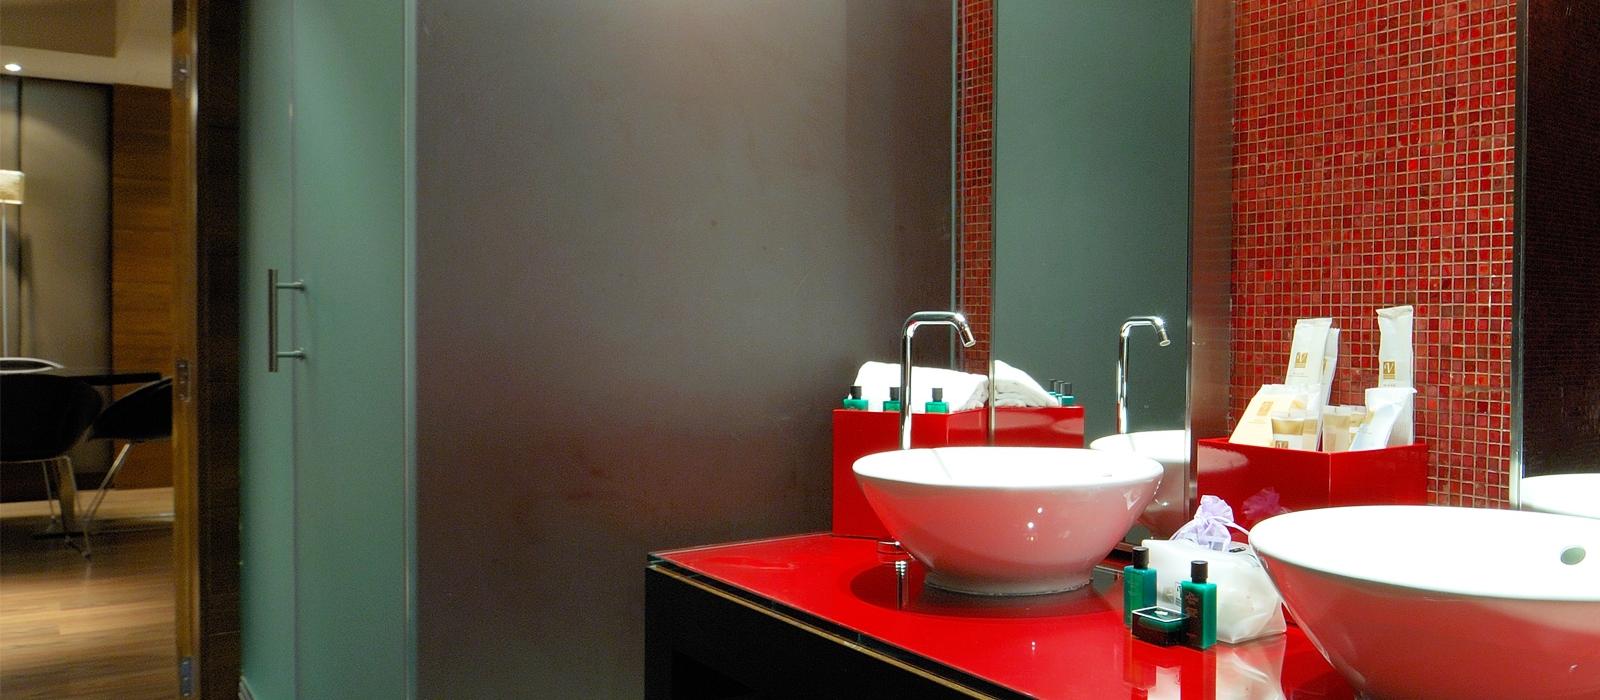 Rooms Hotel Madrid Soho - Vincci Hotels - Double Room